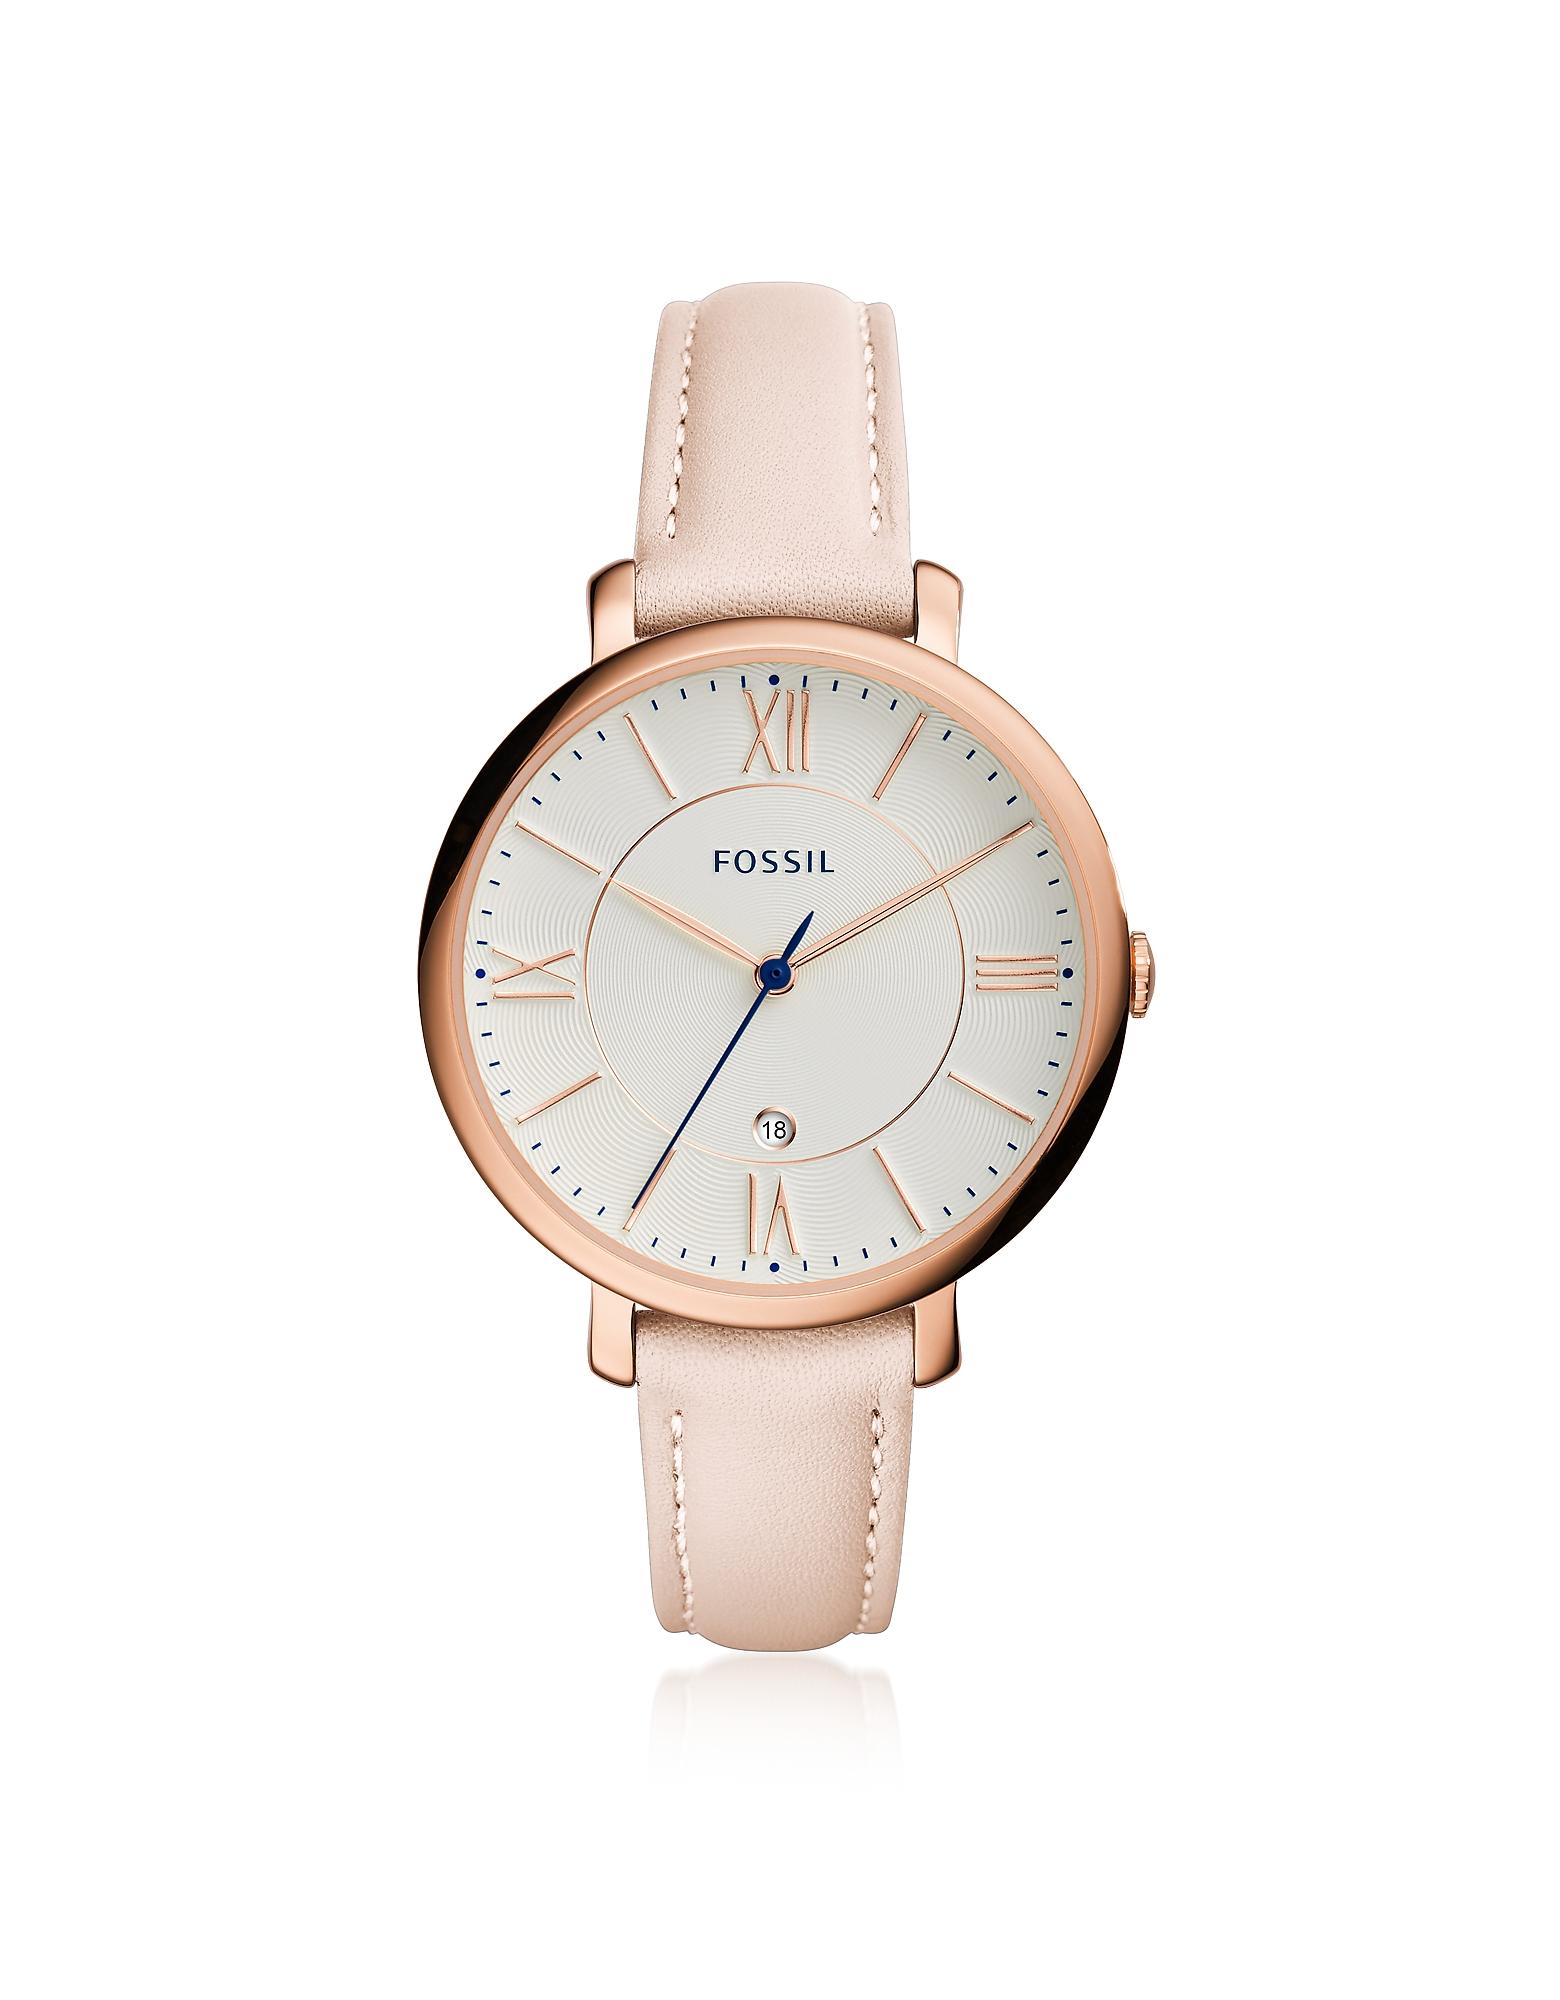 Jacqueline Blush Leather Women's Watch